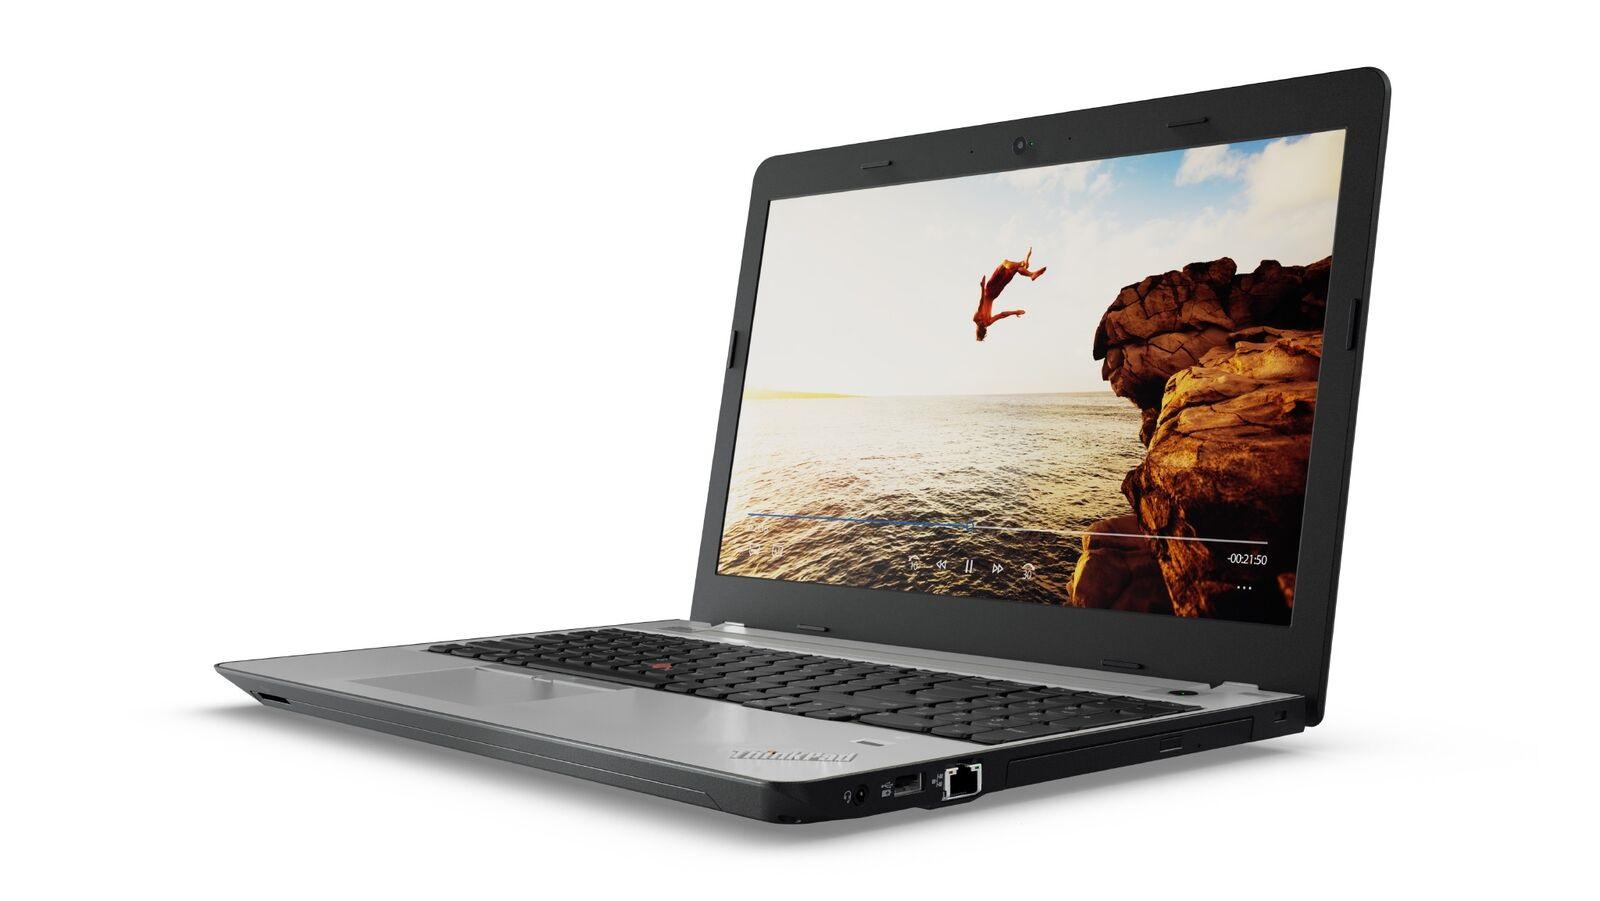 "Lenovo ThinkPad E570 i7-7500U/8GB/256GB SSD/DVD±RW/GeForce GTX 950MX 2GB/15,6""FHD matný/Win10PRO černo-stříbrný"